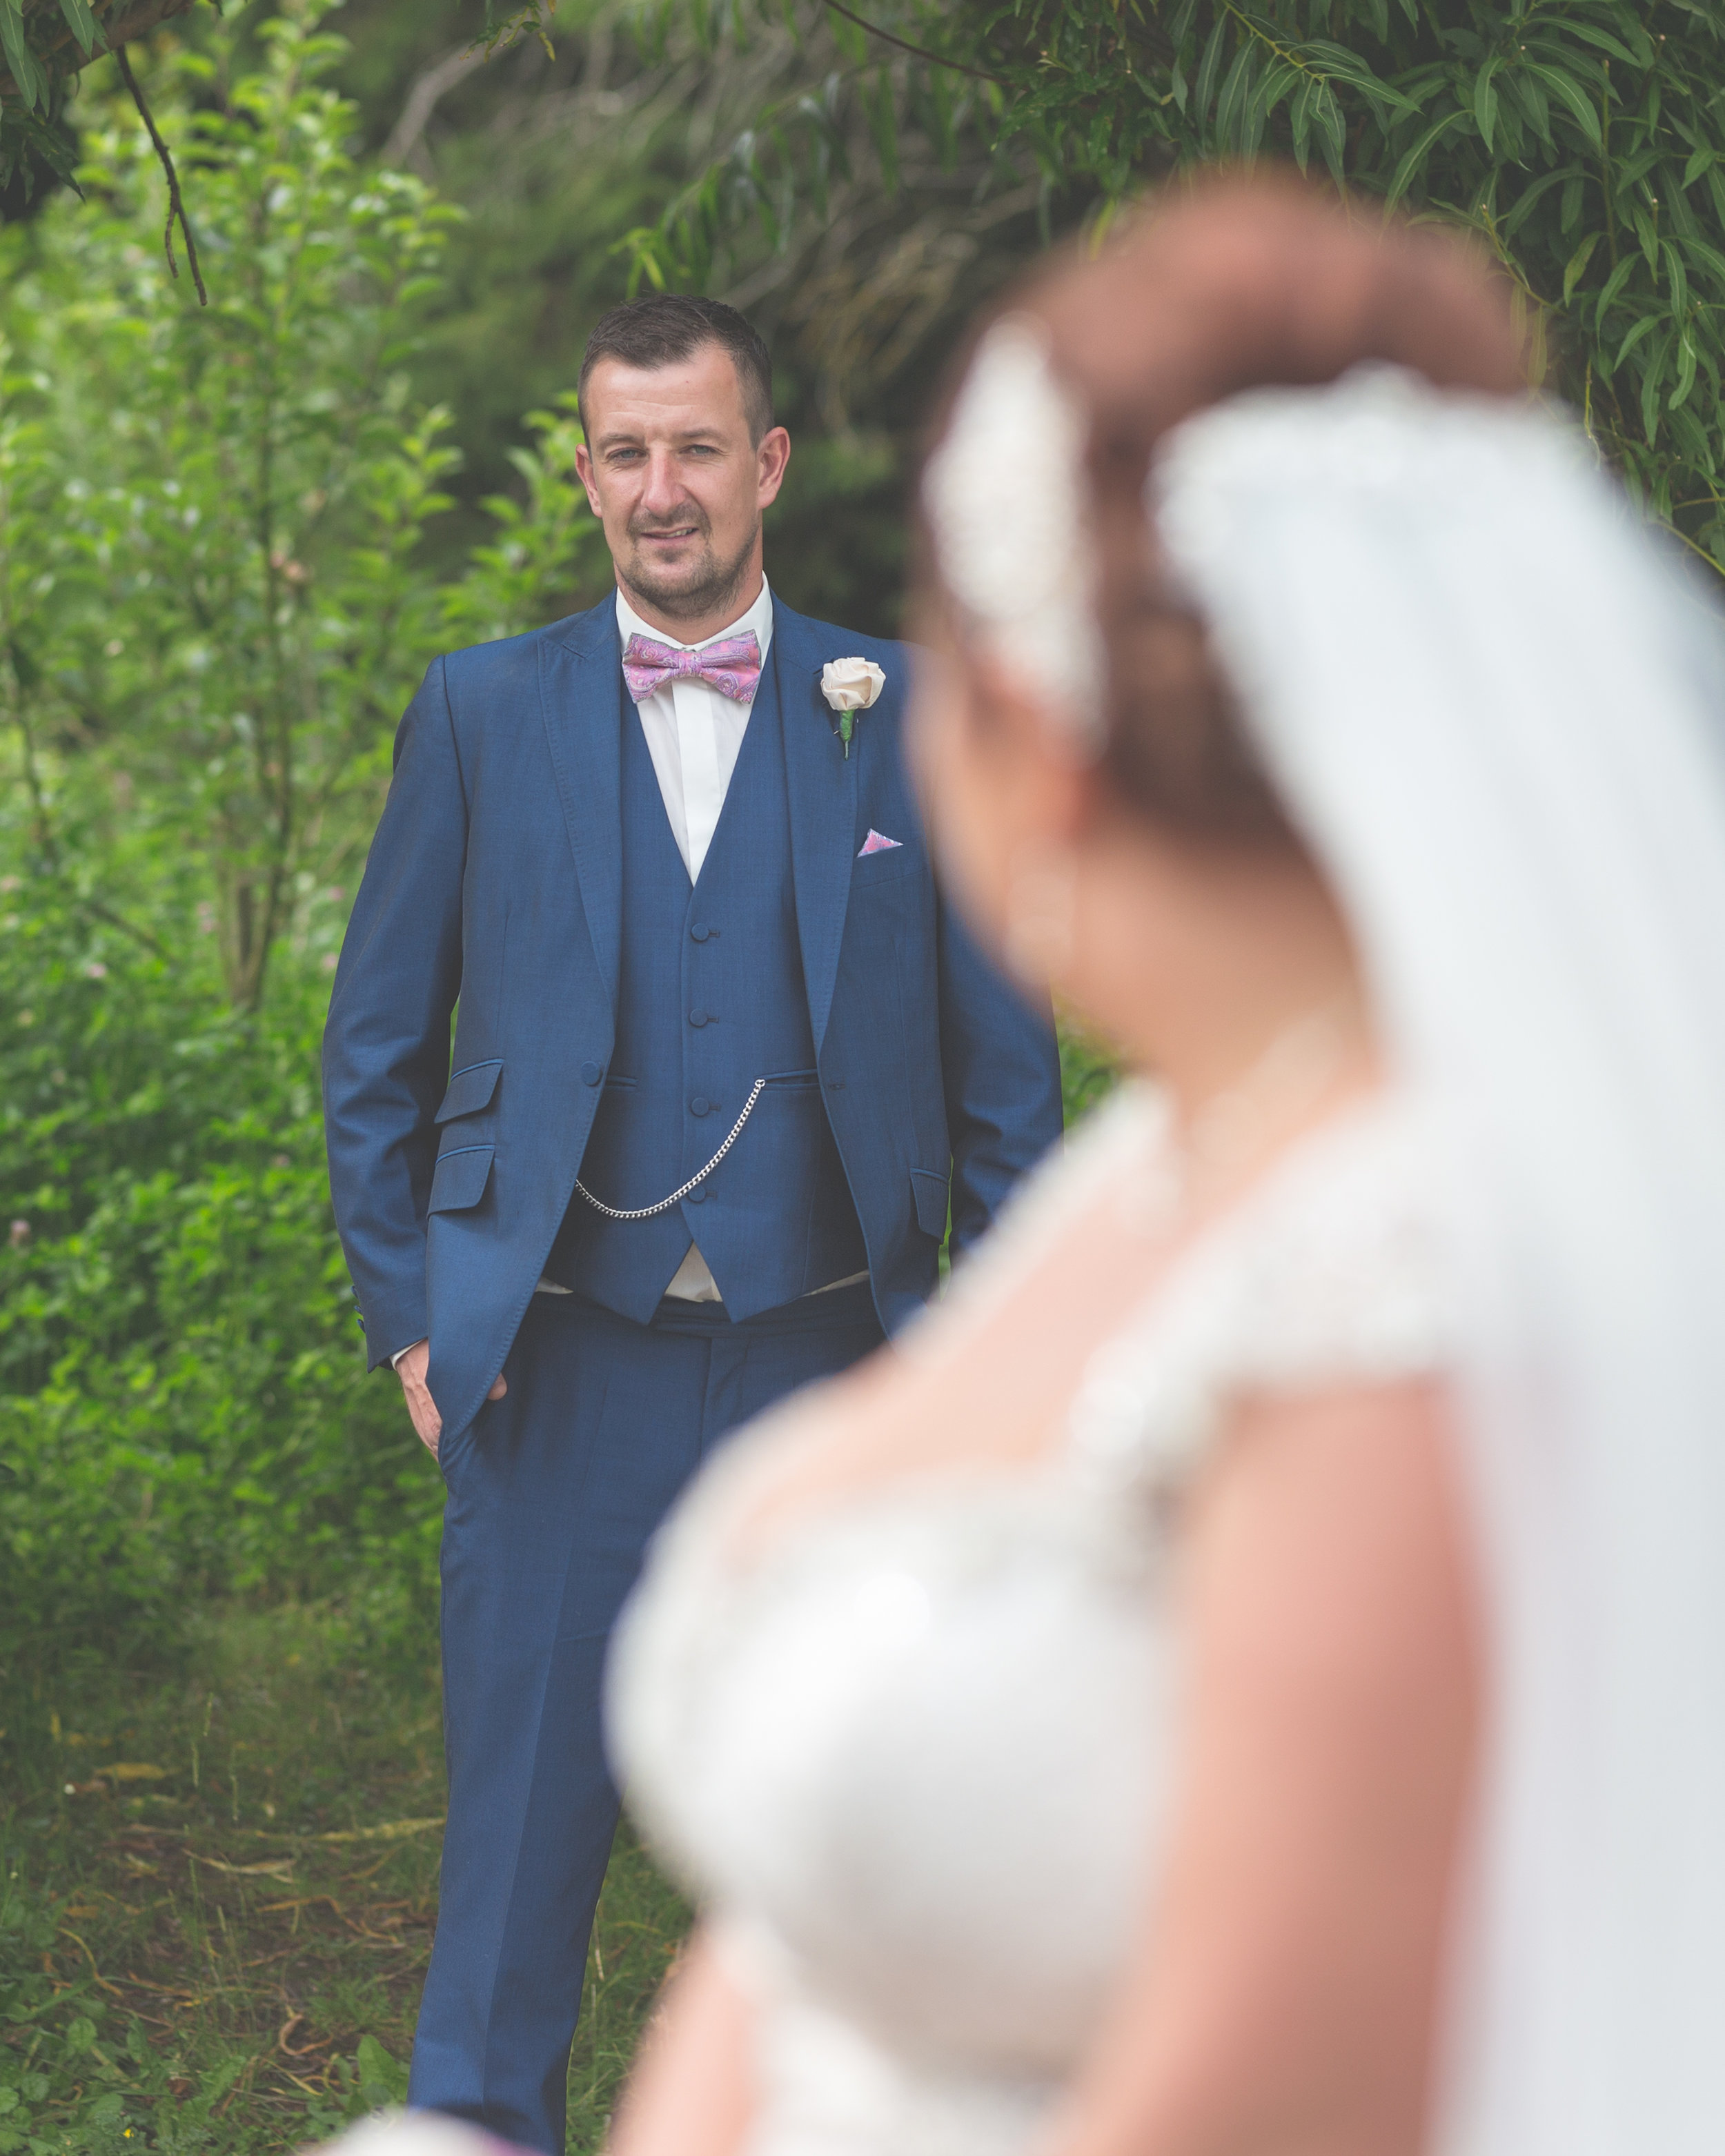 Antoinette & Stephen - Portraits   Brian McEwan Photography   Wedding Photographer Northern Ireland 16.jpg